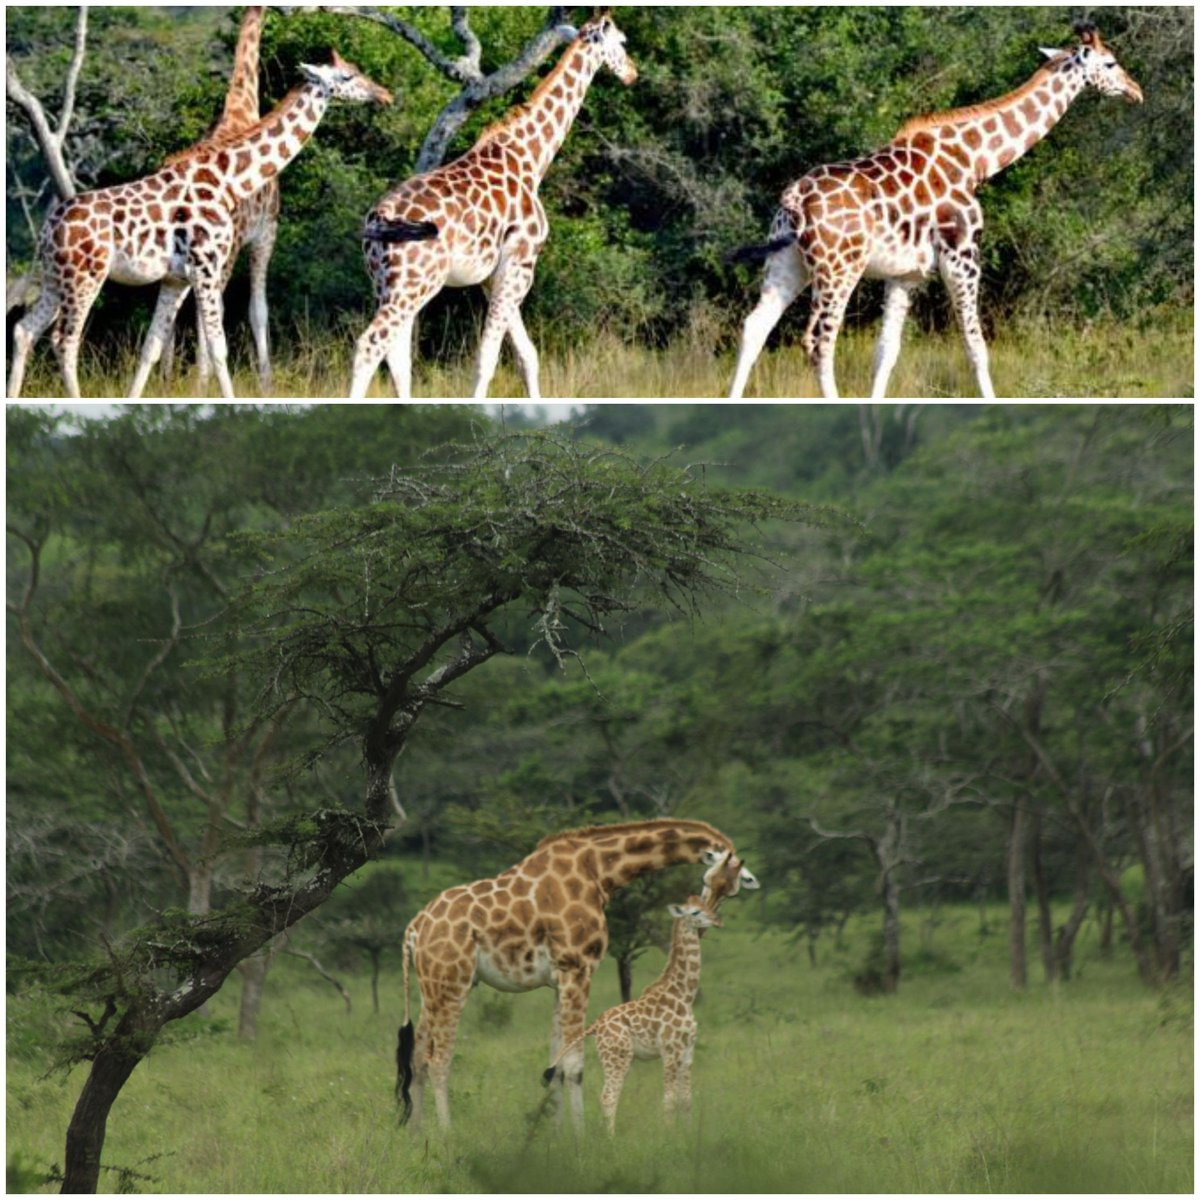 NEWS!!GOOD NEWS!!Another baby Giraffe has been born totalling to 36!!!since their translocation to Lake Mburo National Park. #VisitUganda  #Tulambuleuganda  #LakeMburonationalpark #Tulambulewild